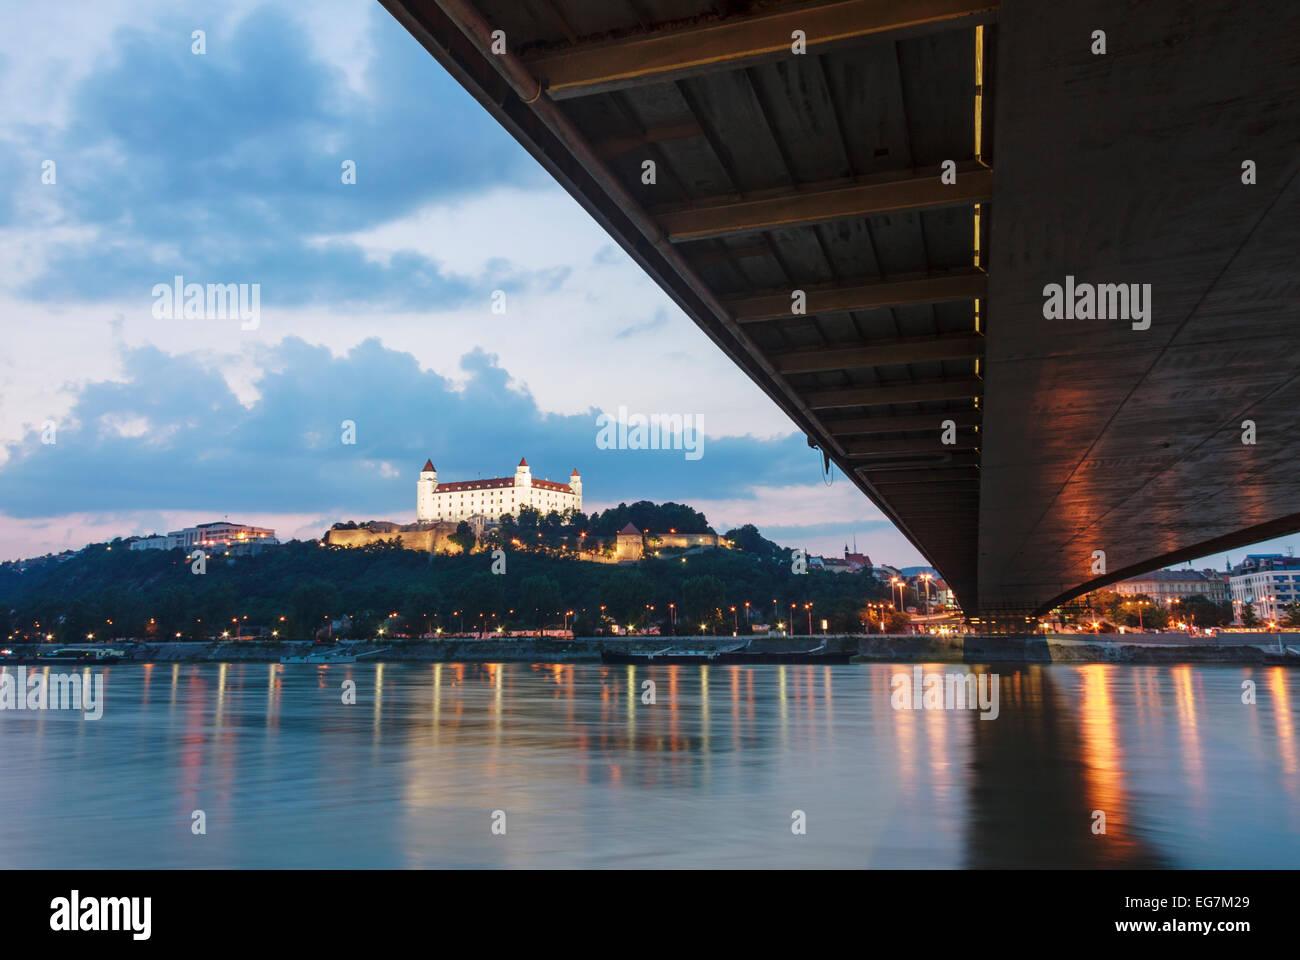 Bratislava castle and New bridge at dusk, Slovakia - Stock Image